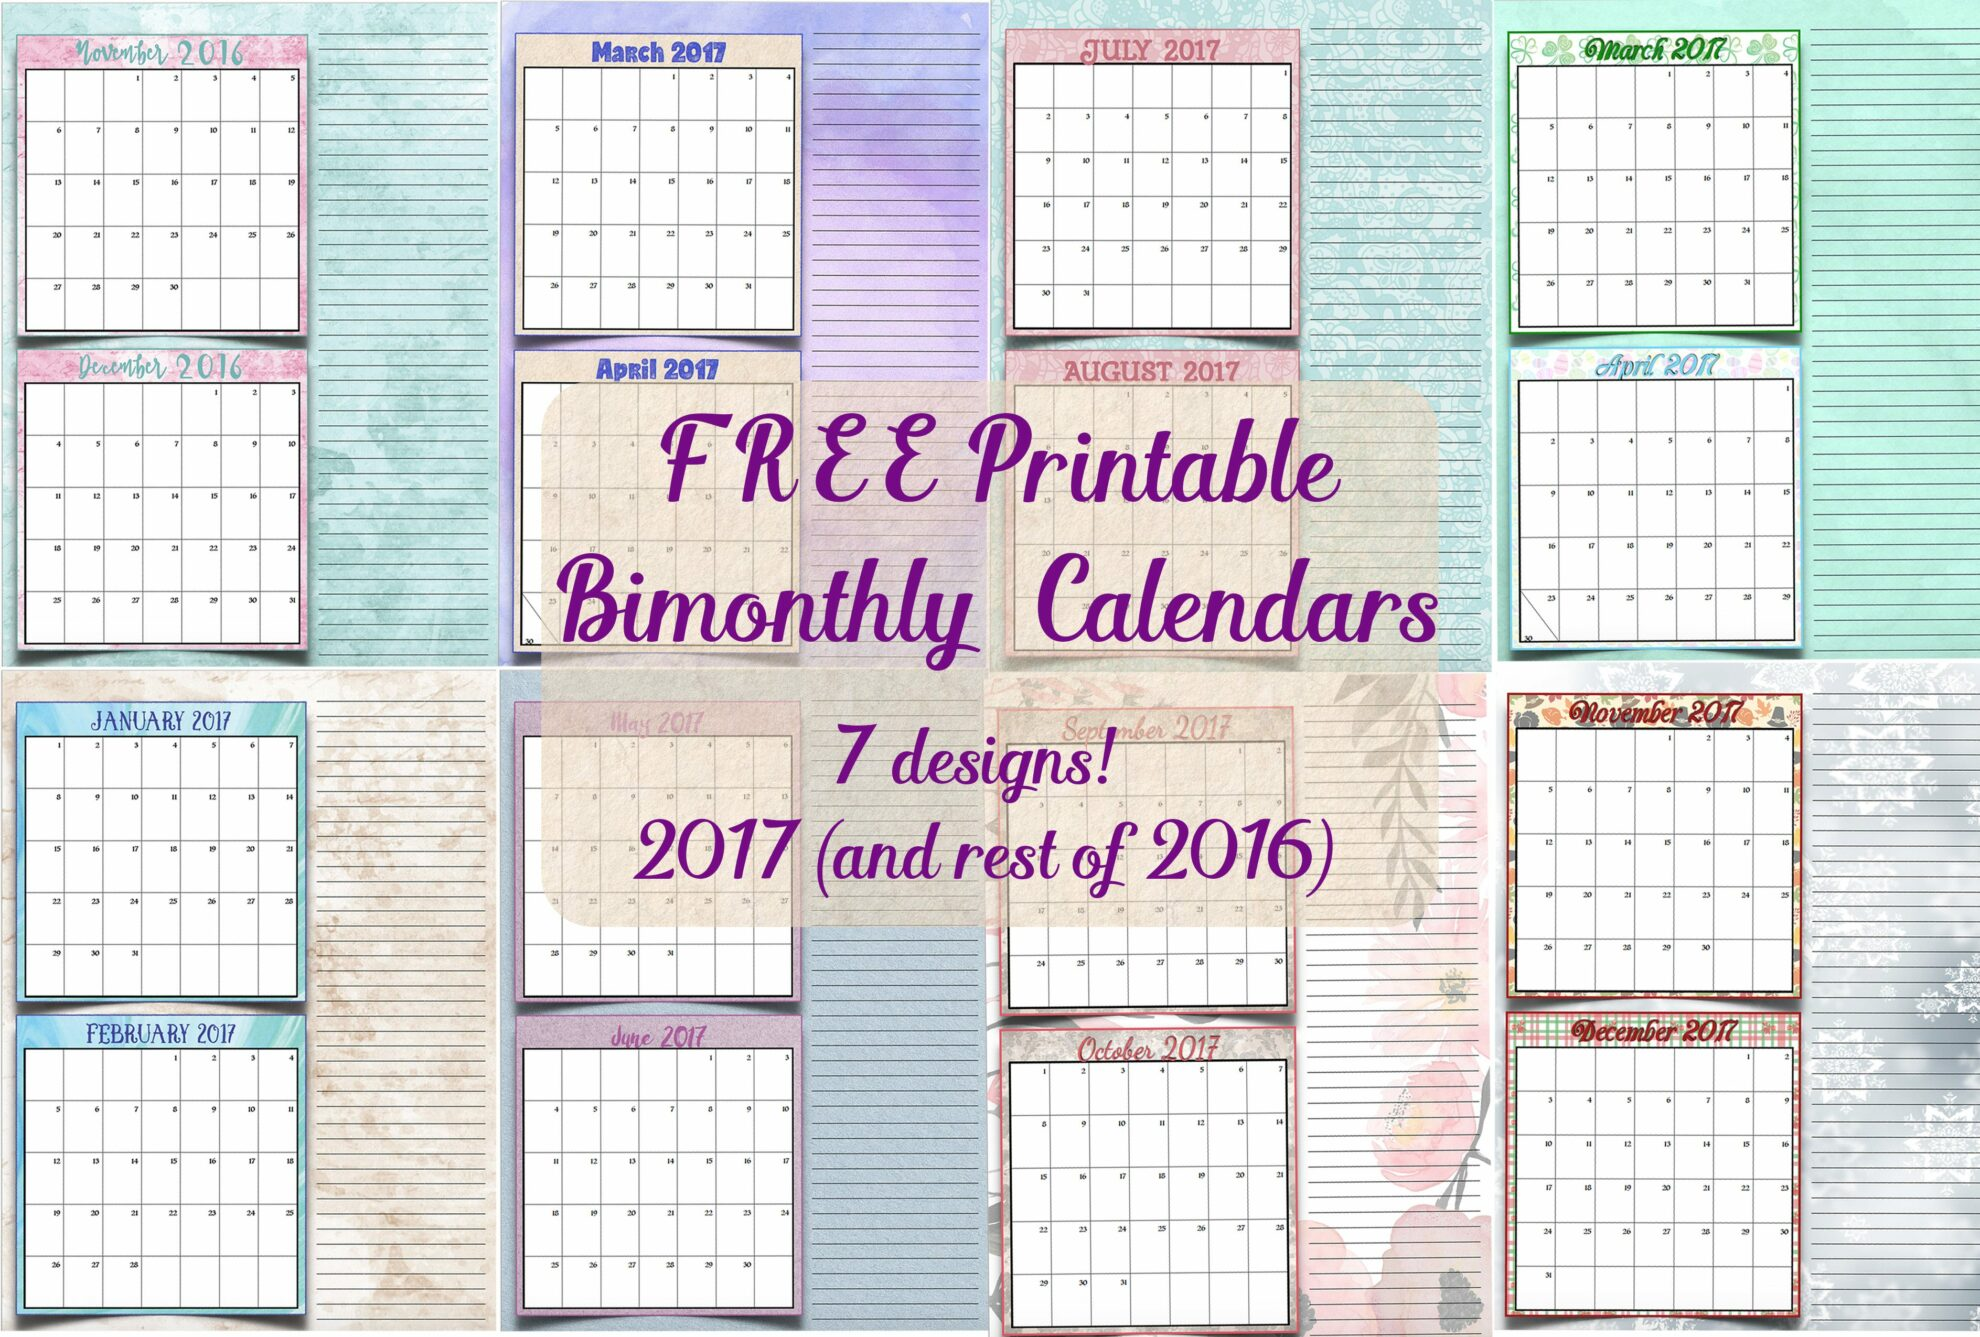 Vintage Calendar 2017 Printable : 書き込みできる 年のカレンダー スケジュール表帳 年 【平成 年】 印刷して使える